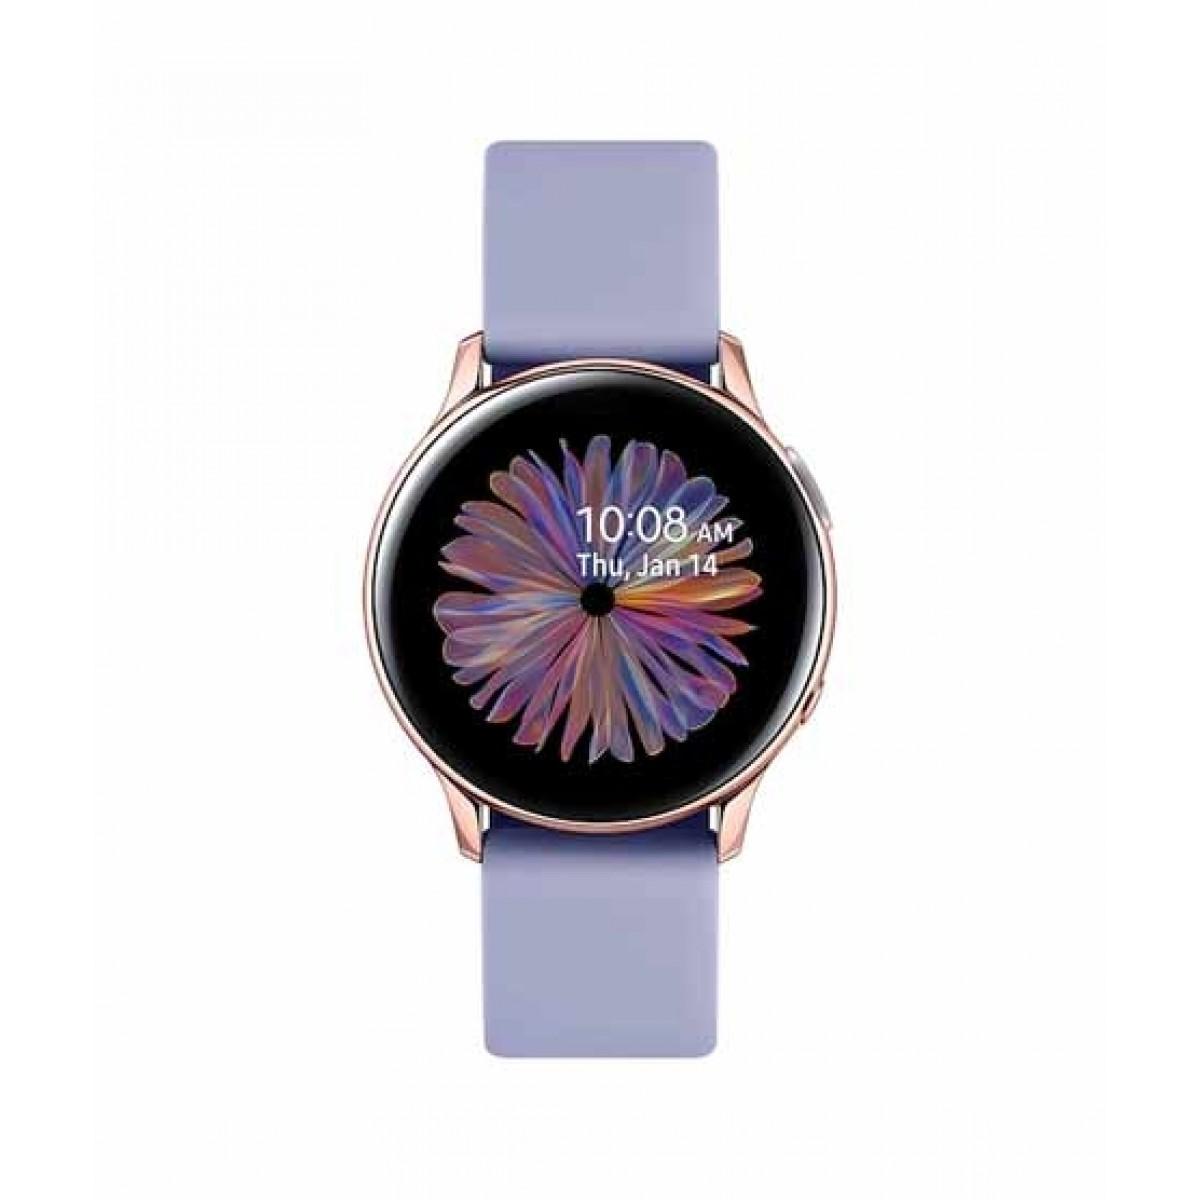 Samsung Galaxy Active 2 Aluminium 40mm Smartwatch Phantom Violet